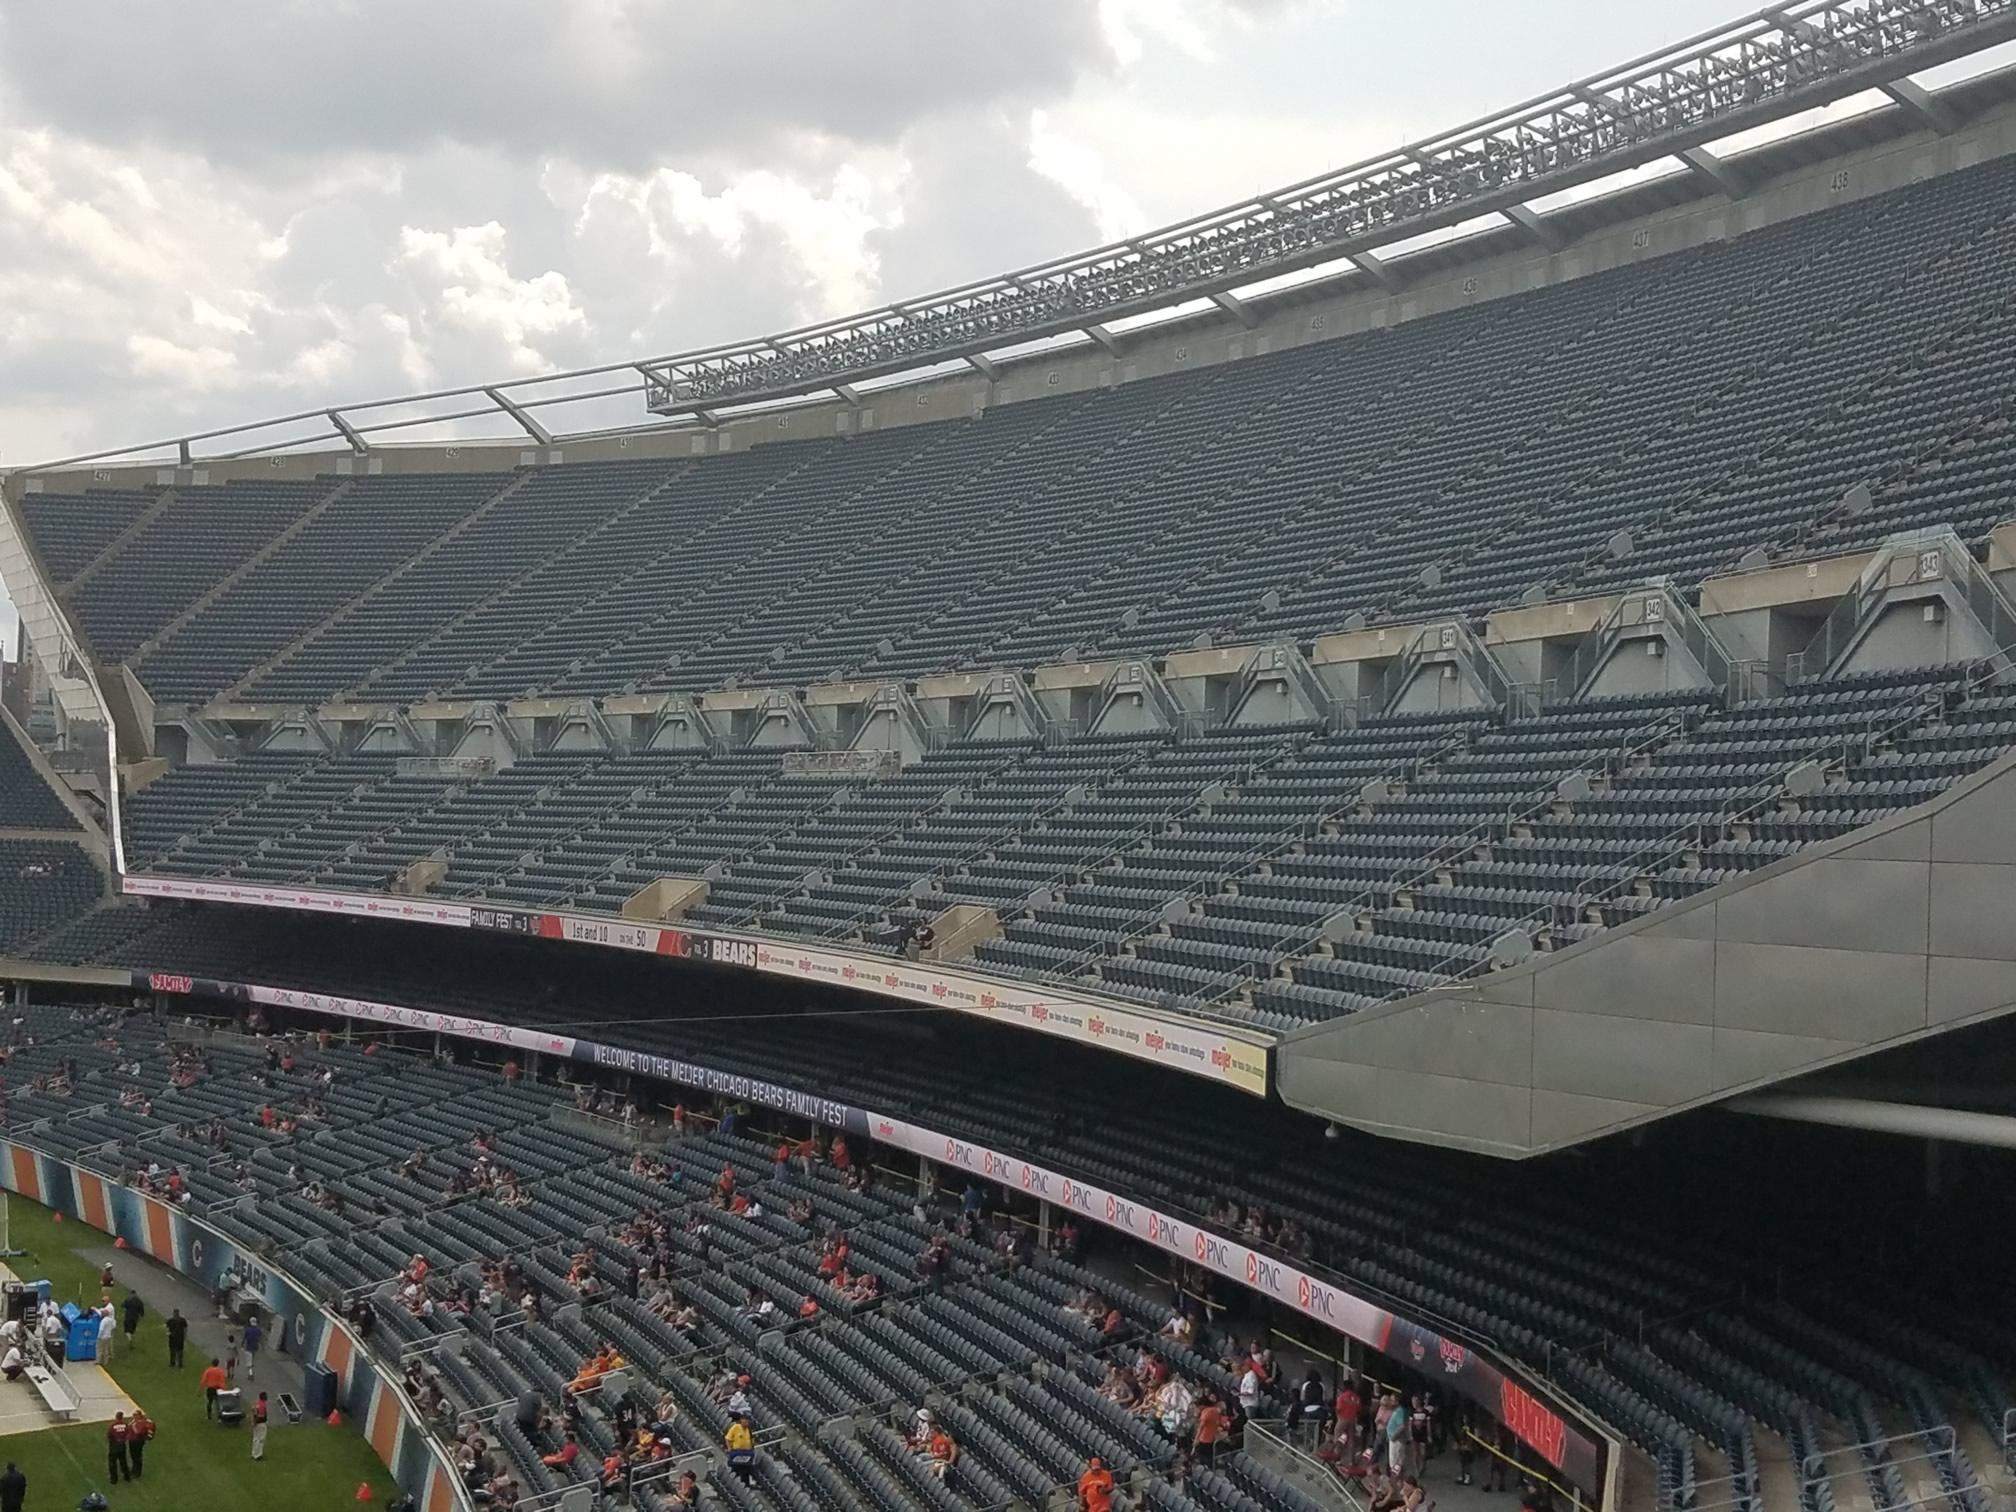 Soldier Field Media Deck Football Seating Rateyourseatscom